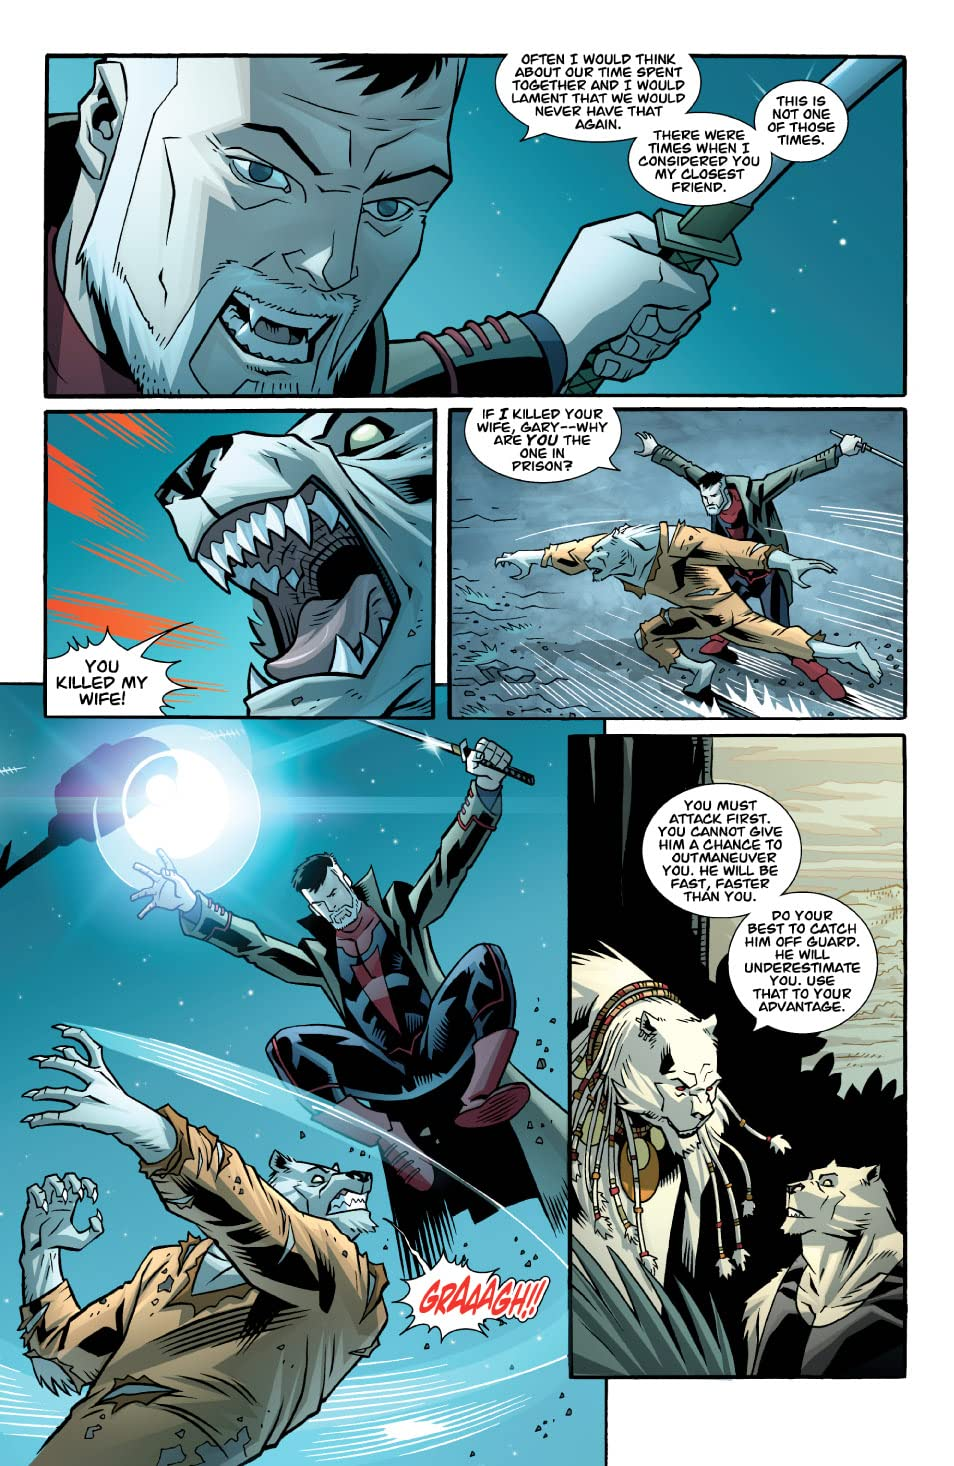 The Astounding Wolf-Man #16